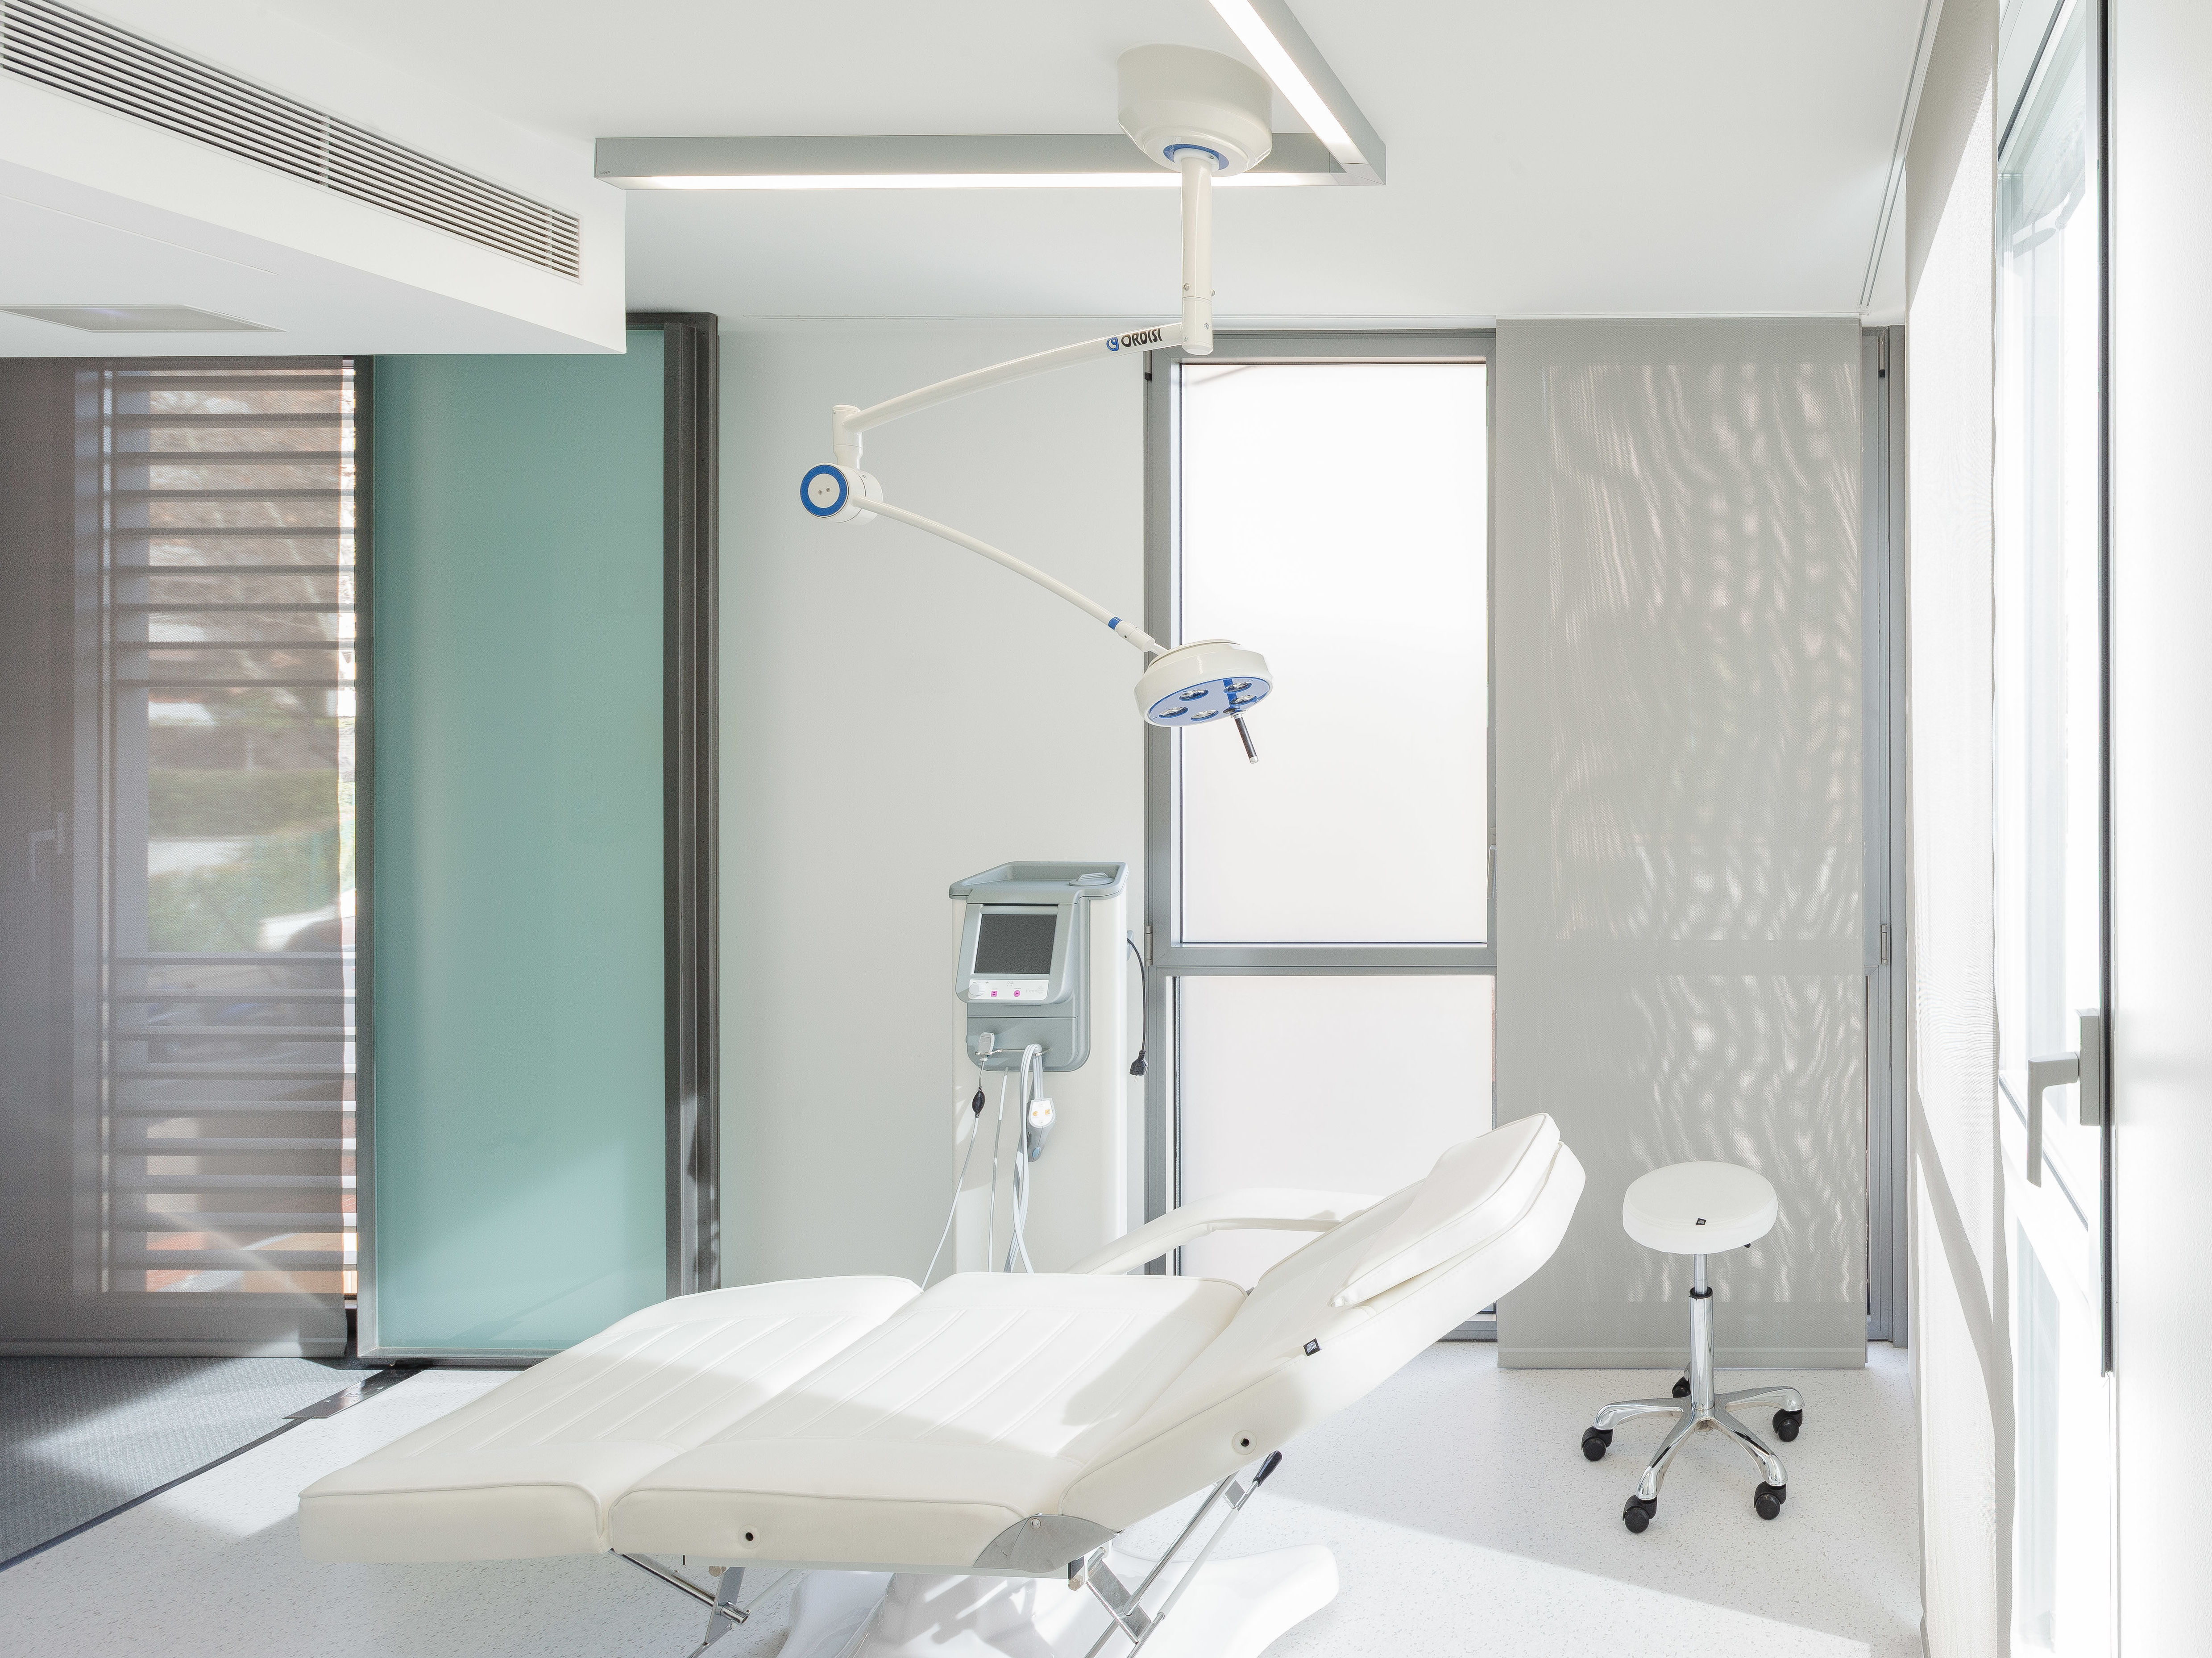 Foto 1 de Centros de estética en Barcelona | Serena Clinic